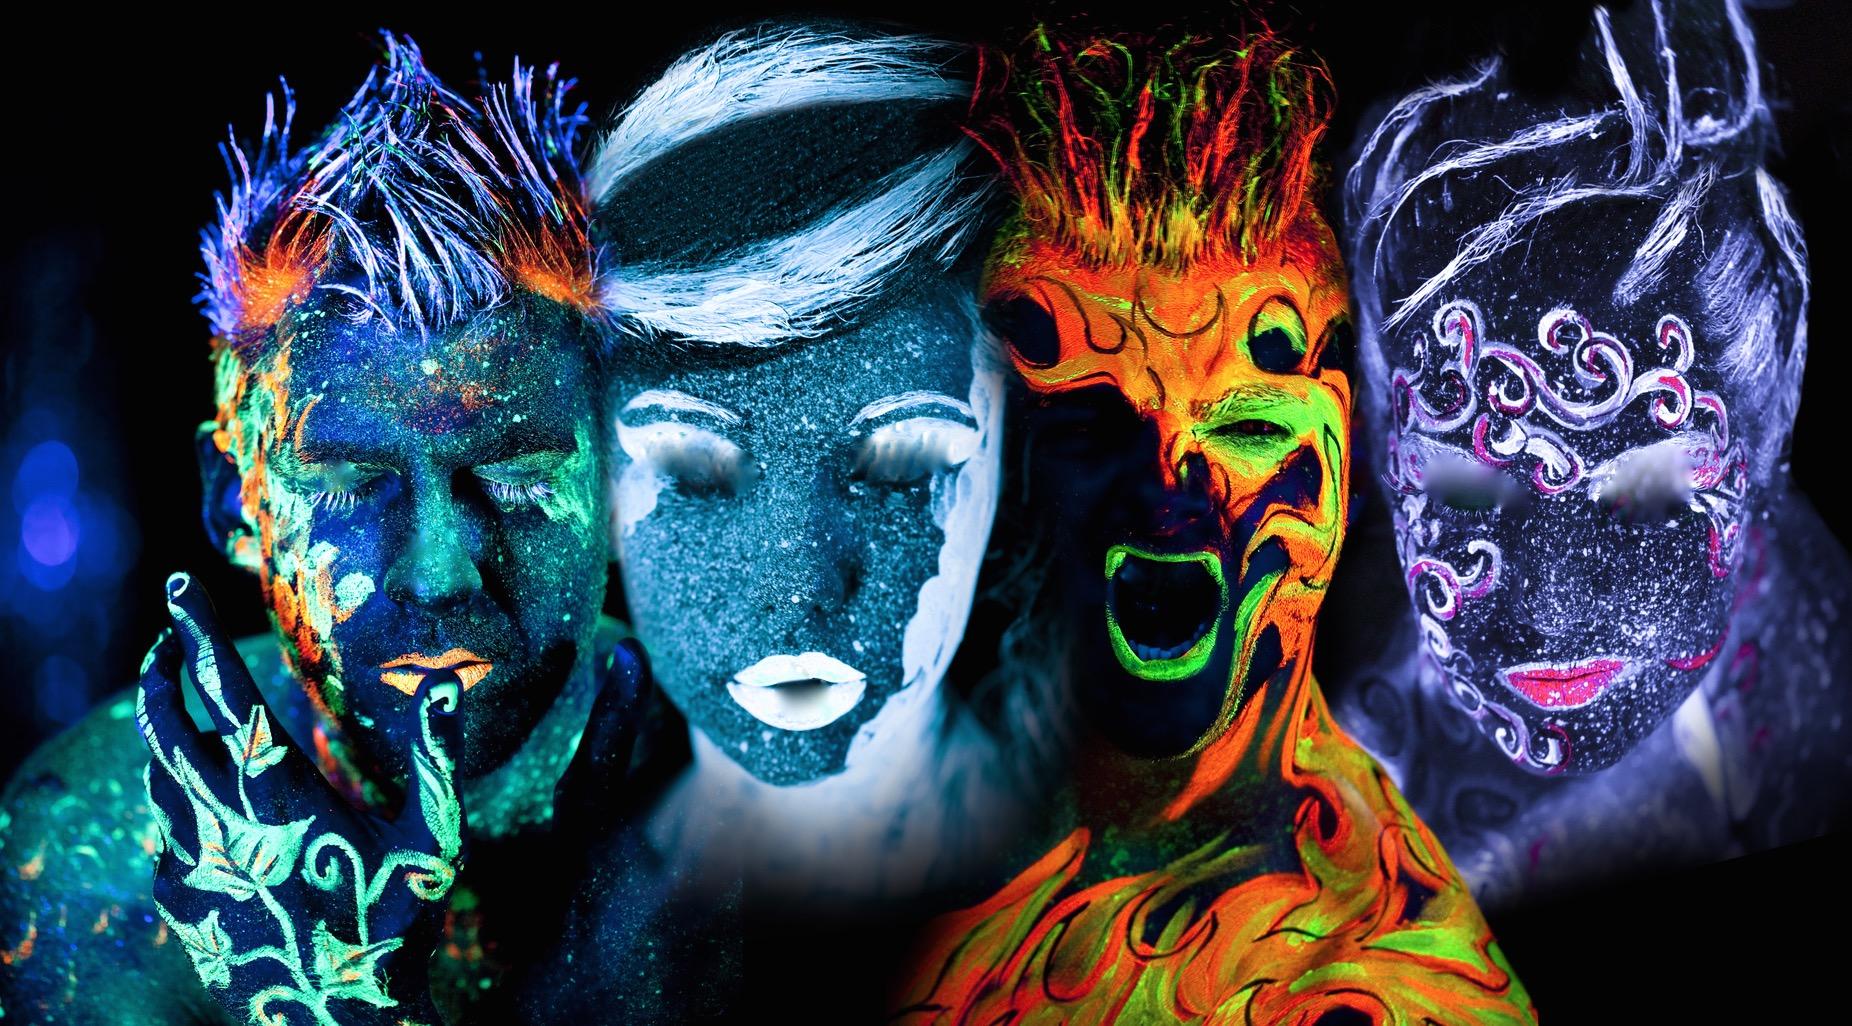 Natural Mystic group